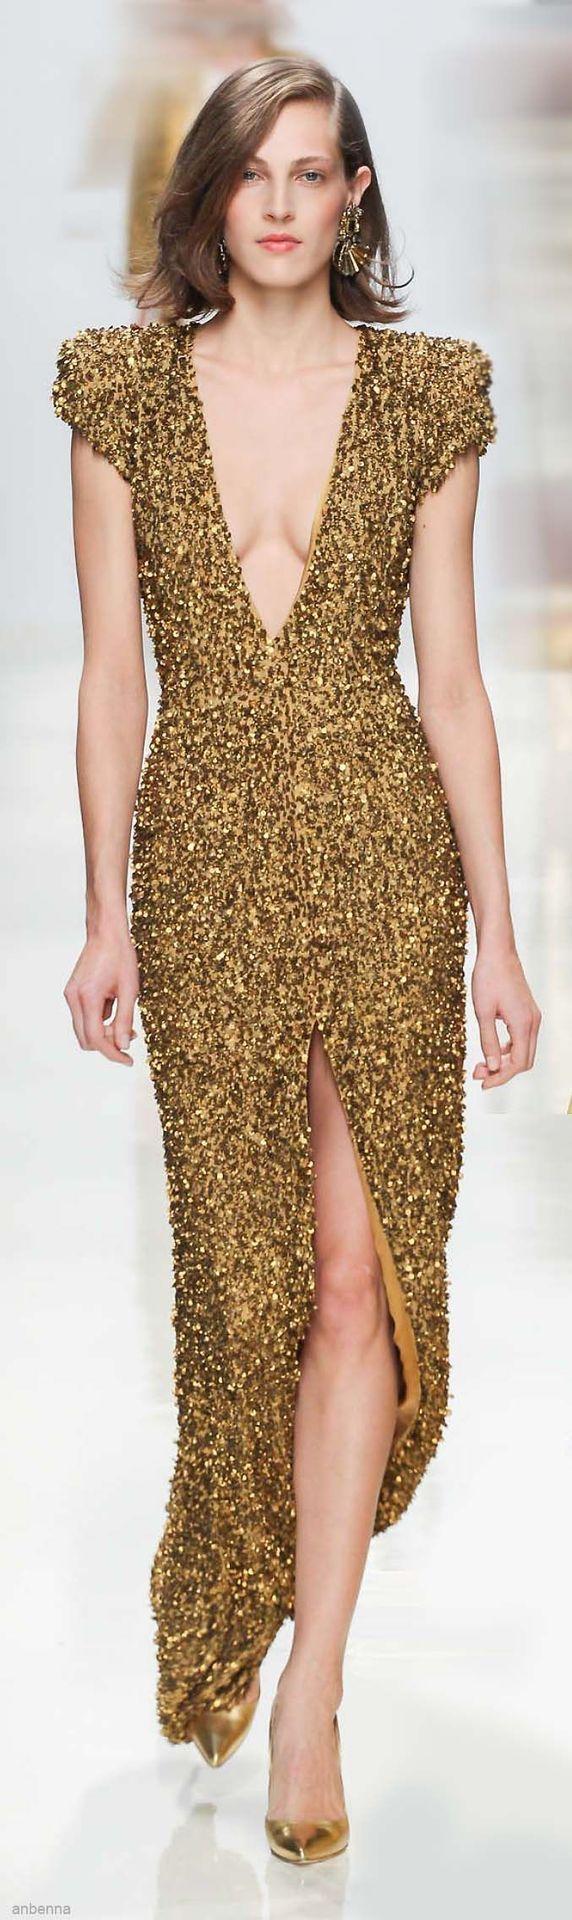 44 best Sequin Dresses images on Pinterest   Gold sequins, Gold ...